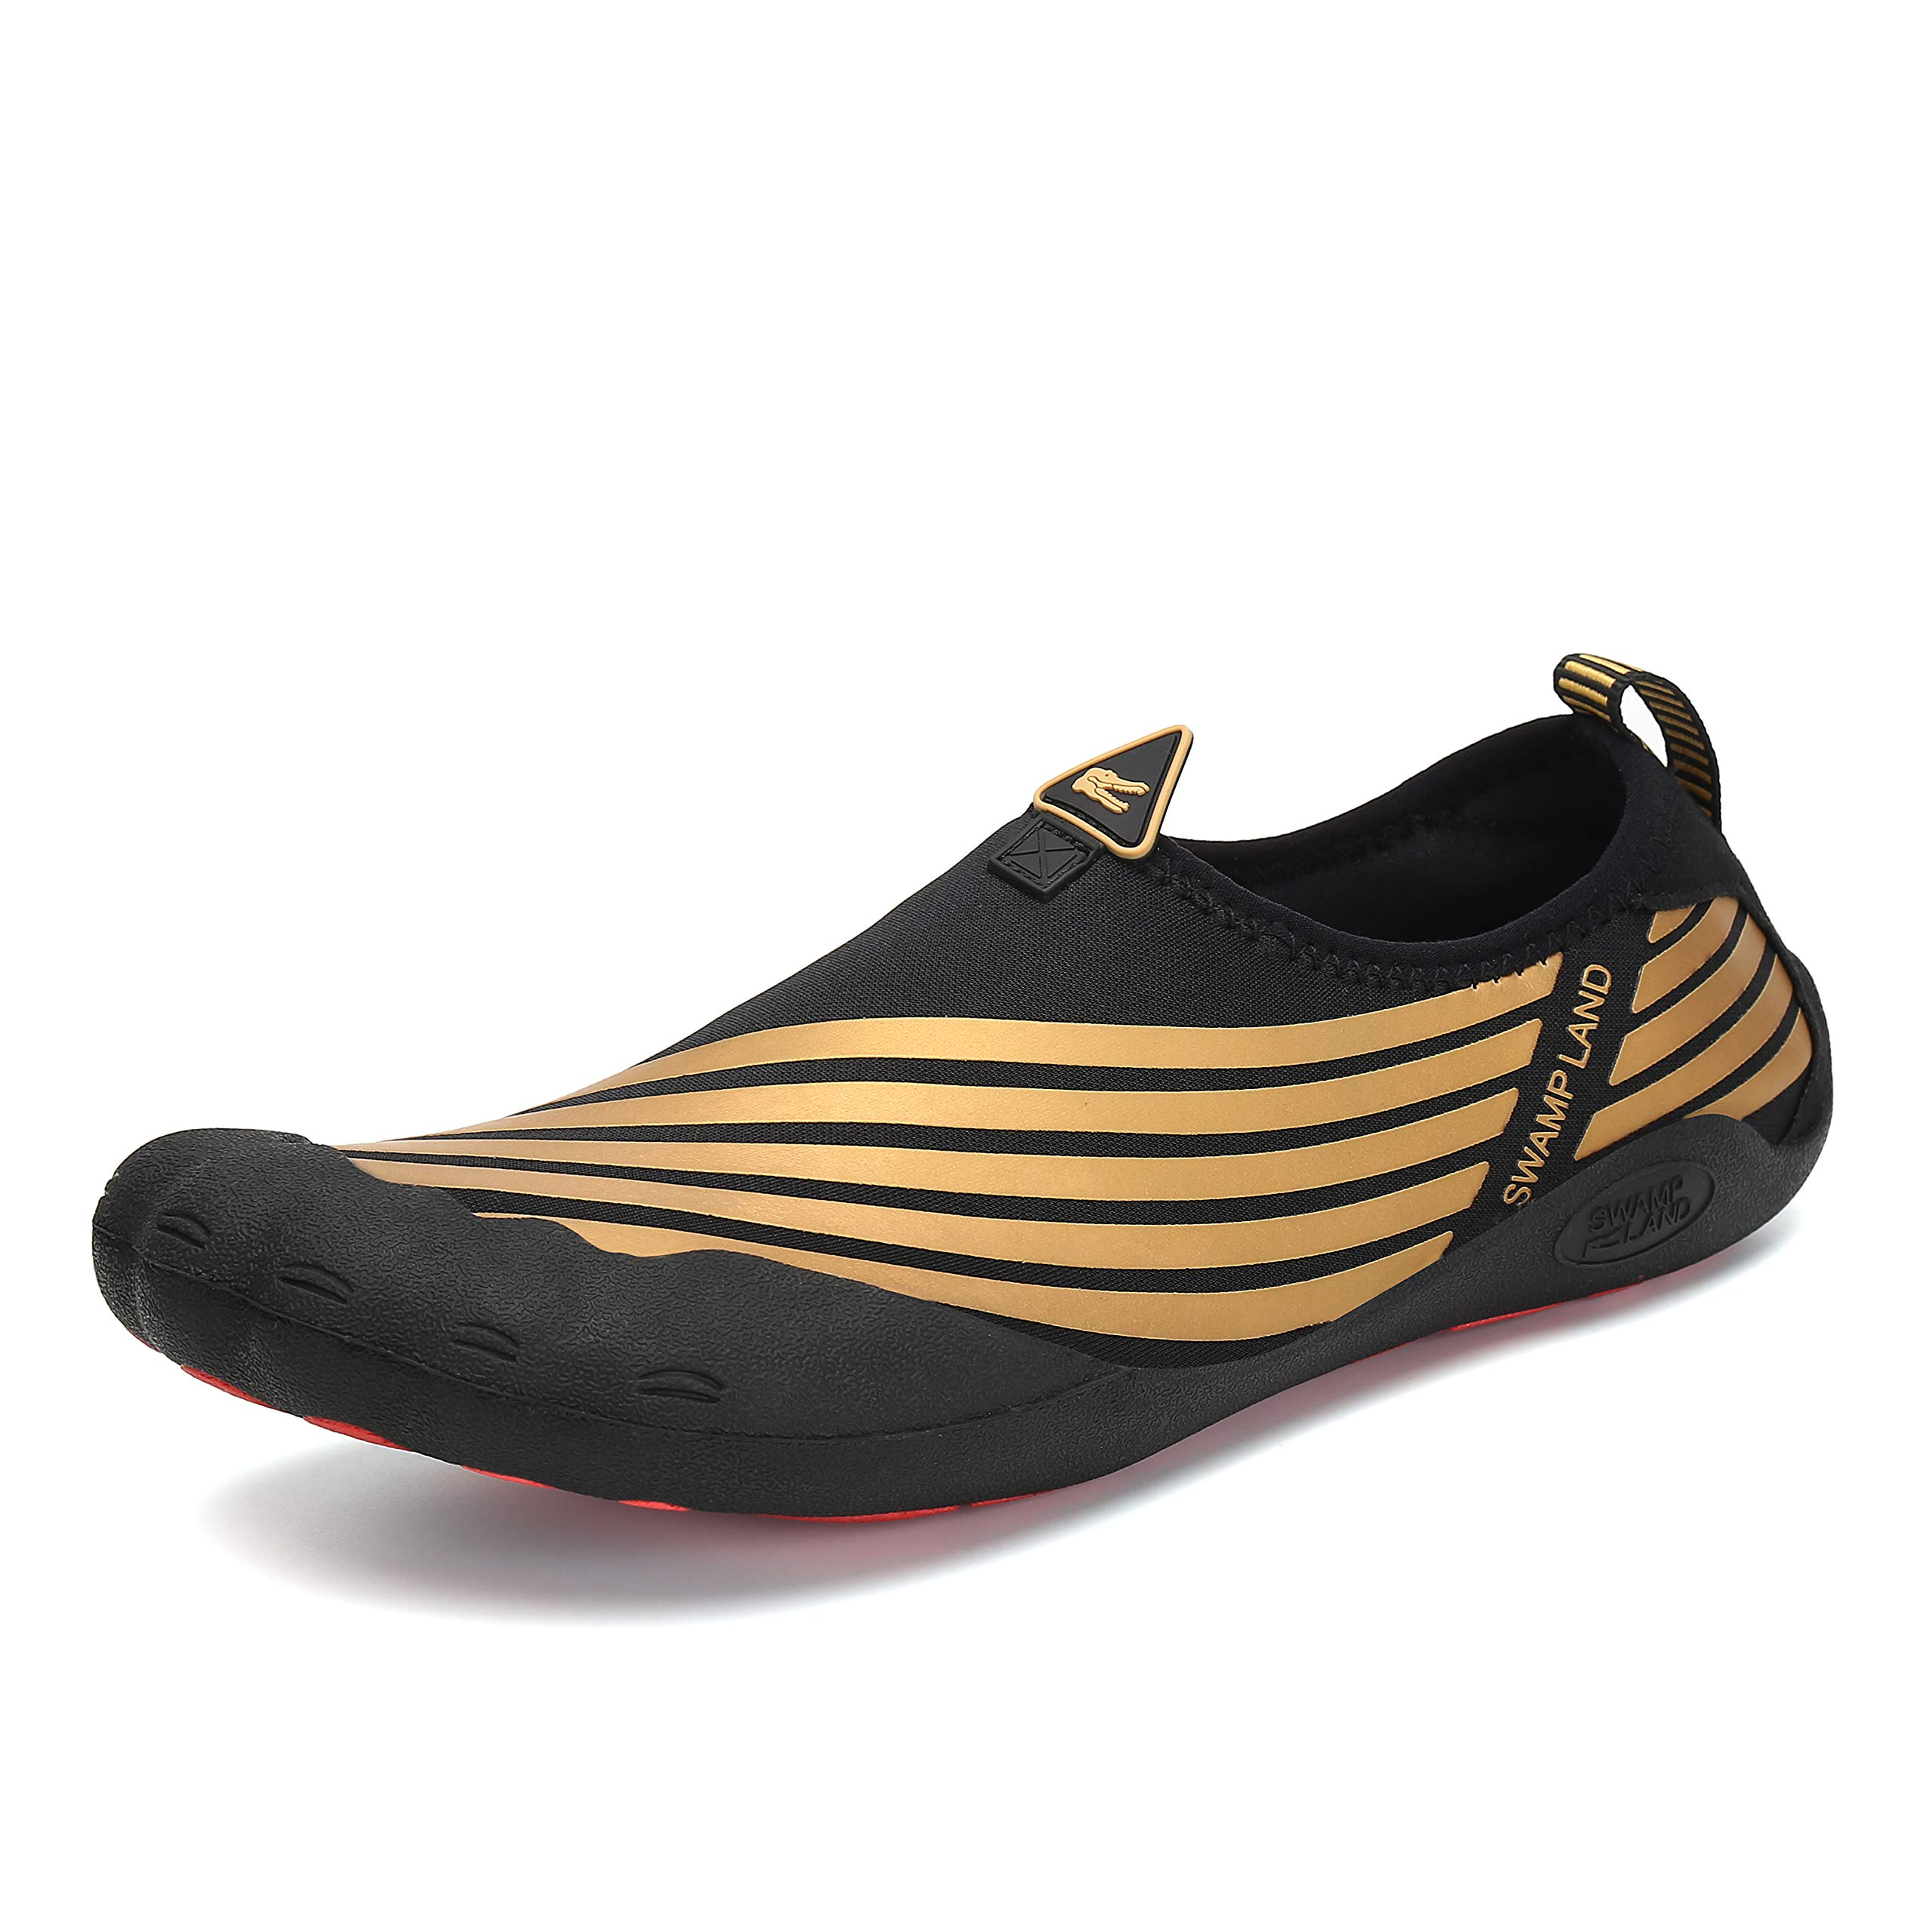 0d4dd61b2305 katliu Mens Water Shoes Wide Barefoot Hiking Trail Running Shoe Womens  Outdoor Swimming Socks